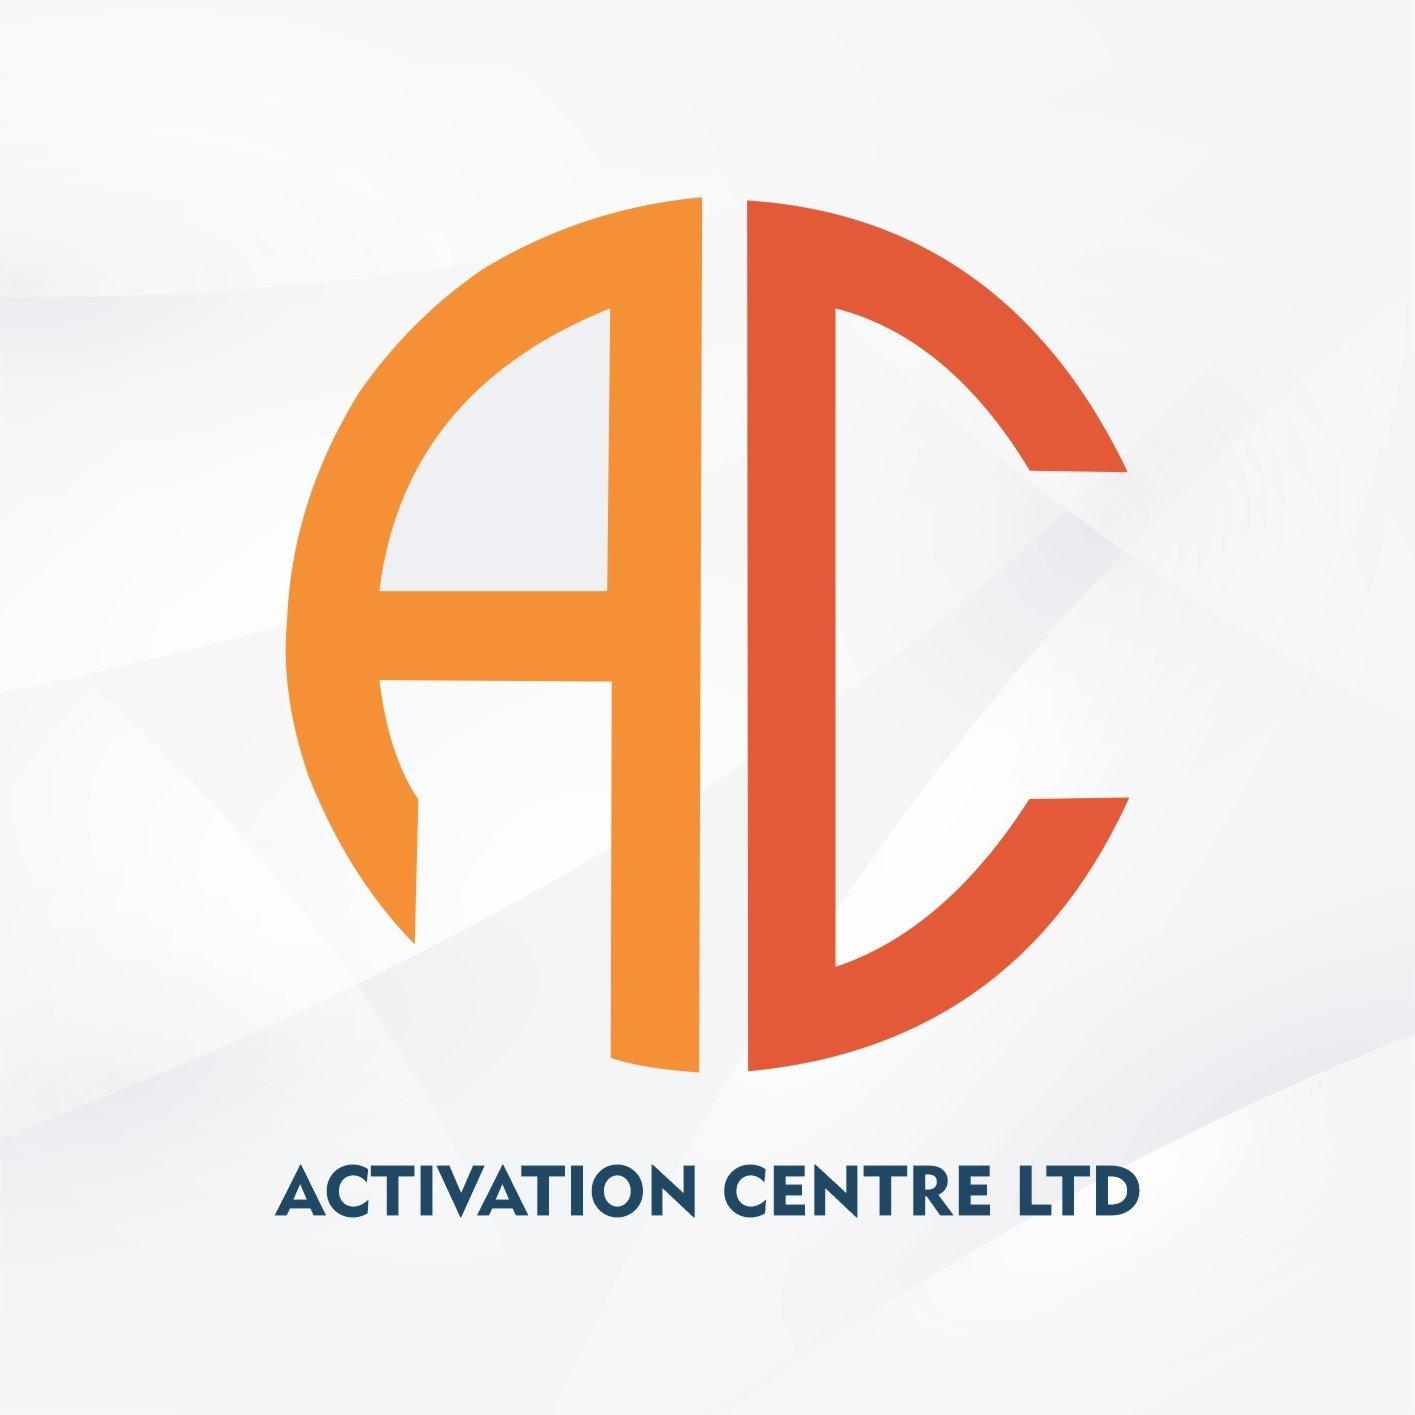 ActivationCentreLTD